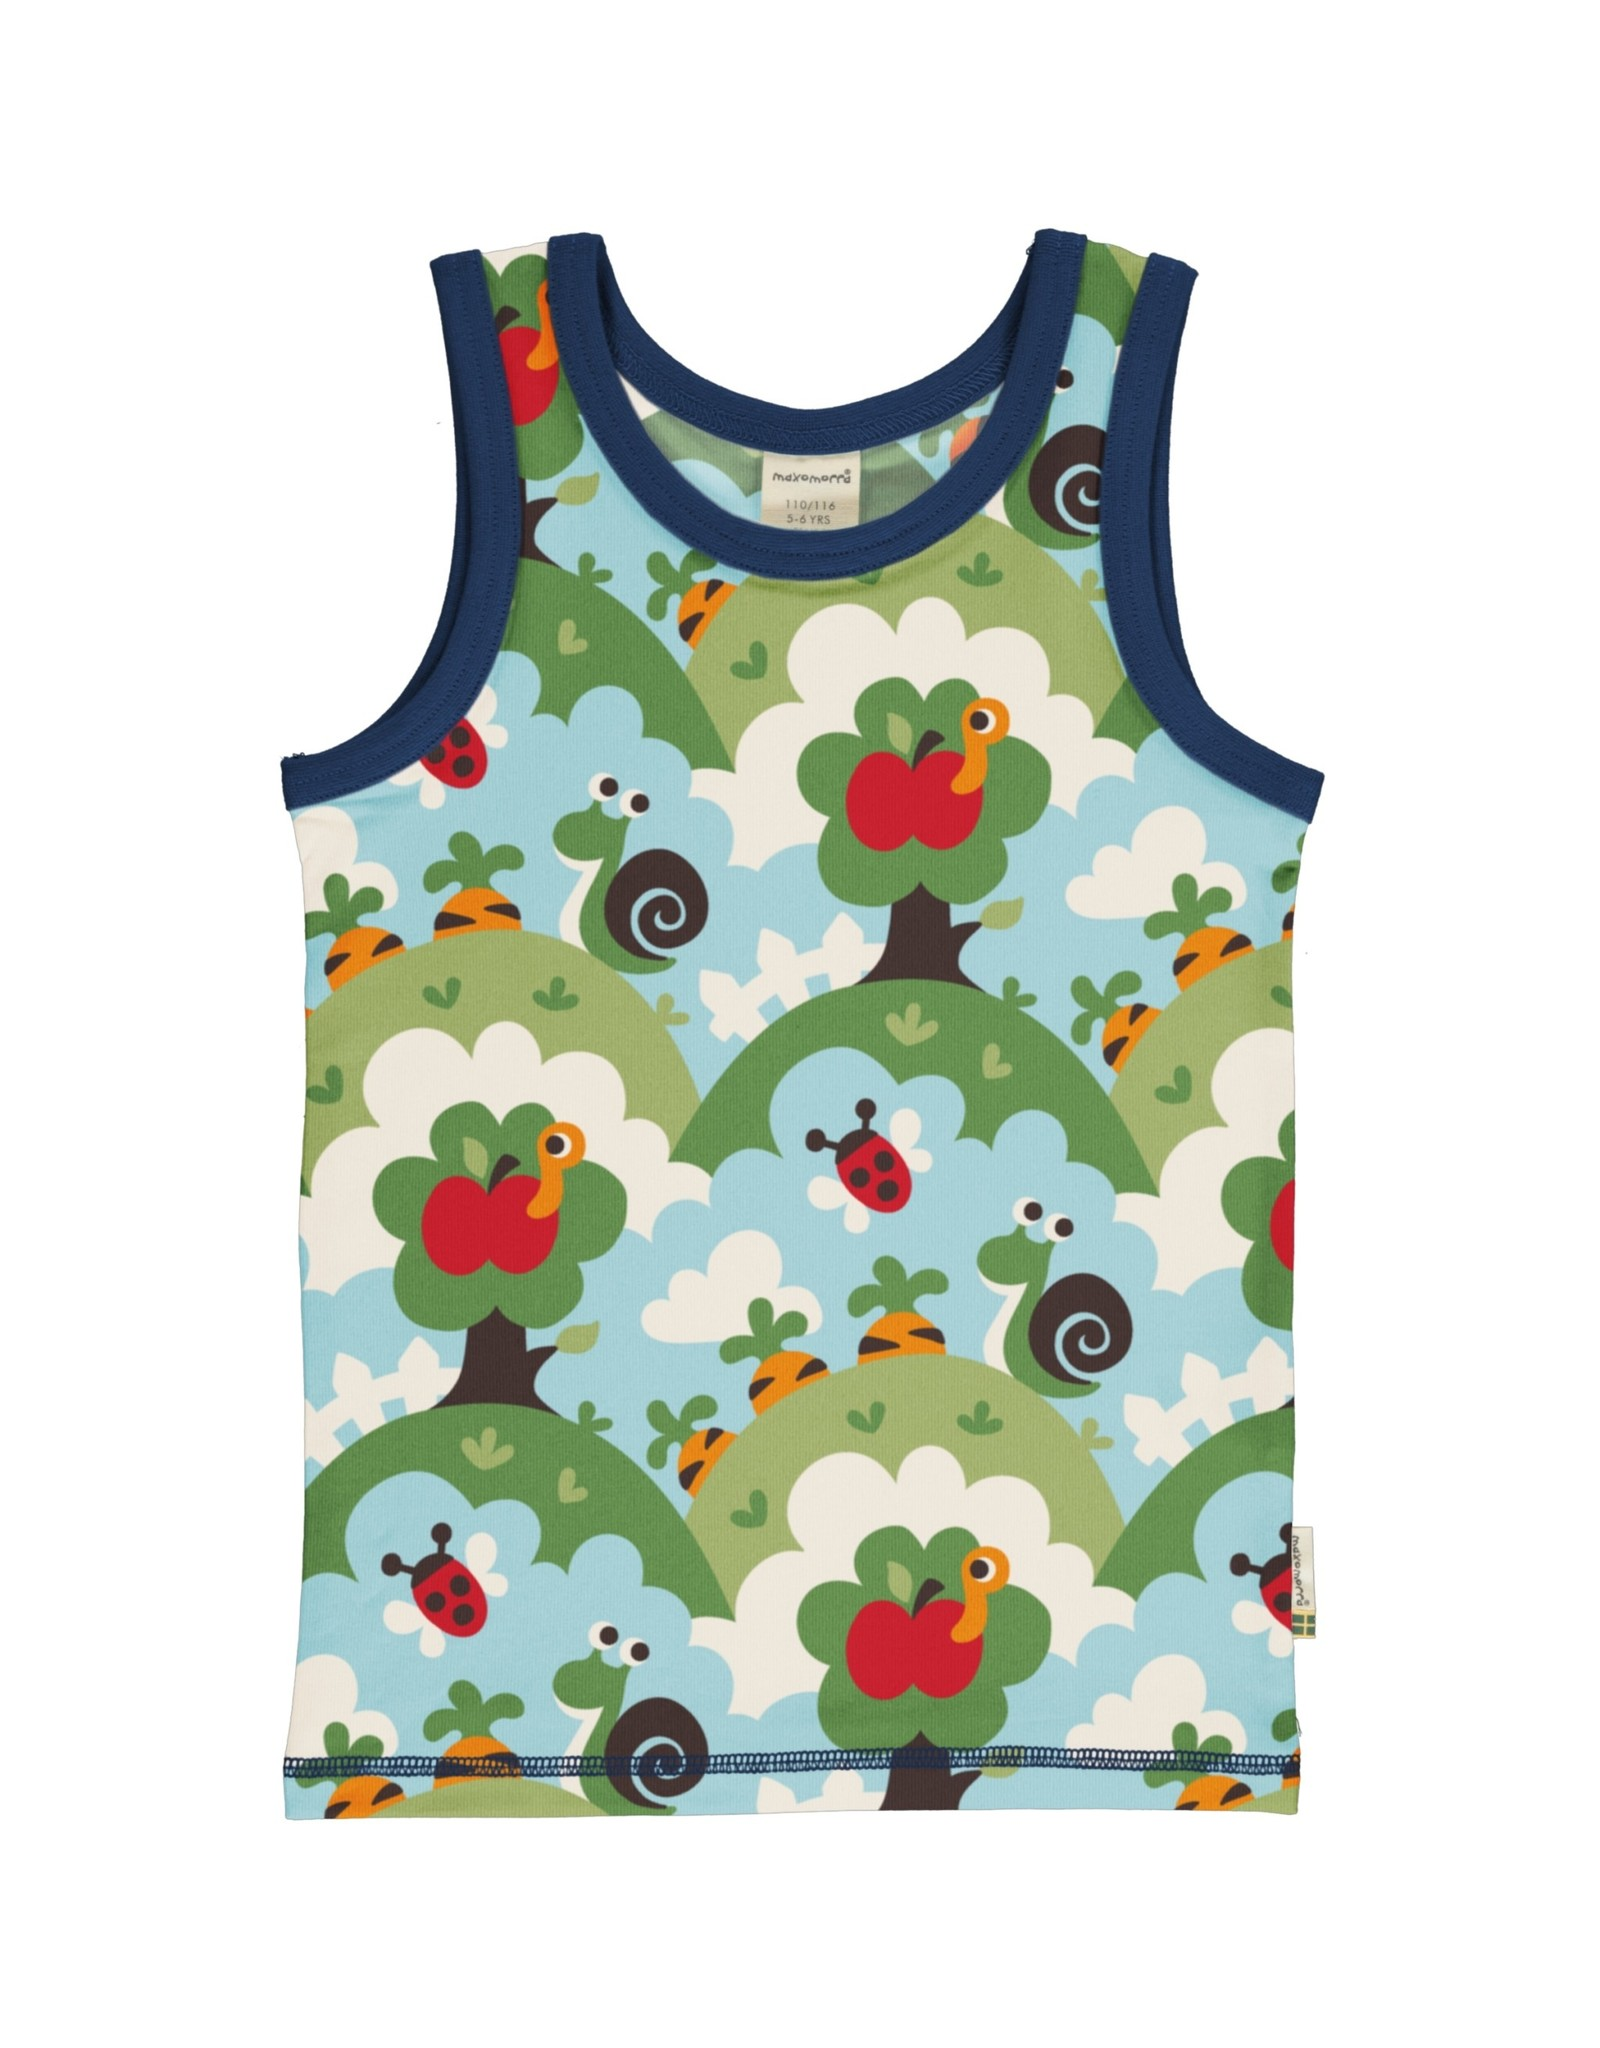 Maxomorra Mouwloze t-shirt met tuintaferelen